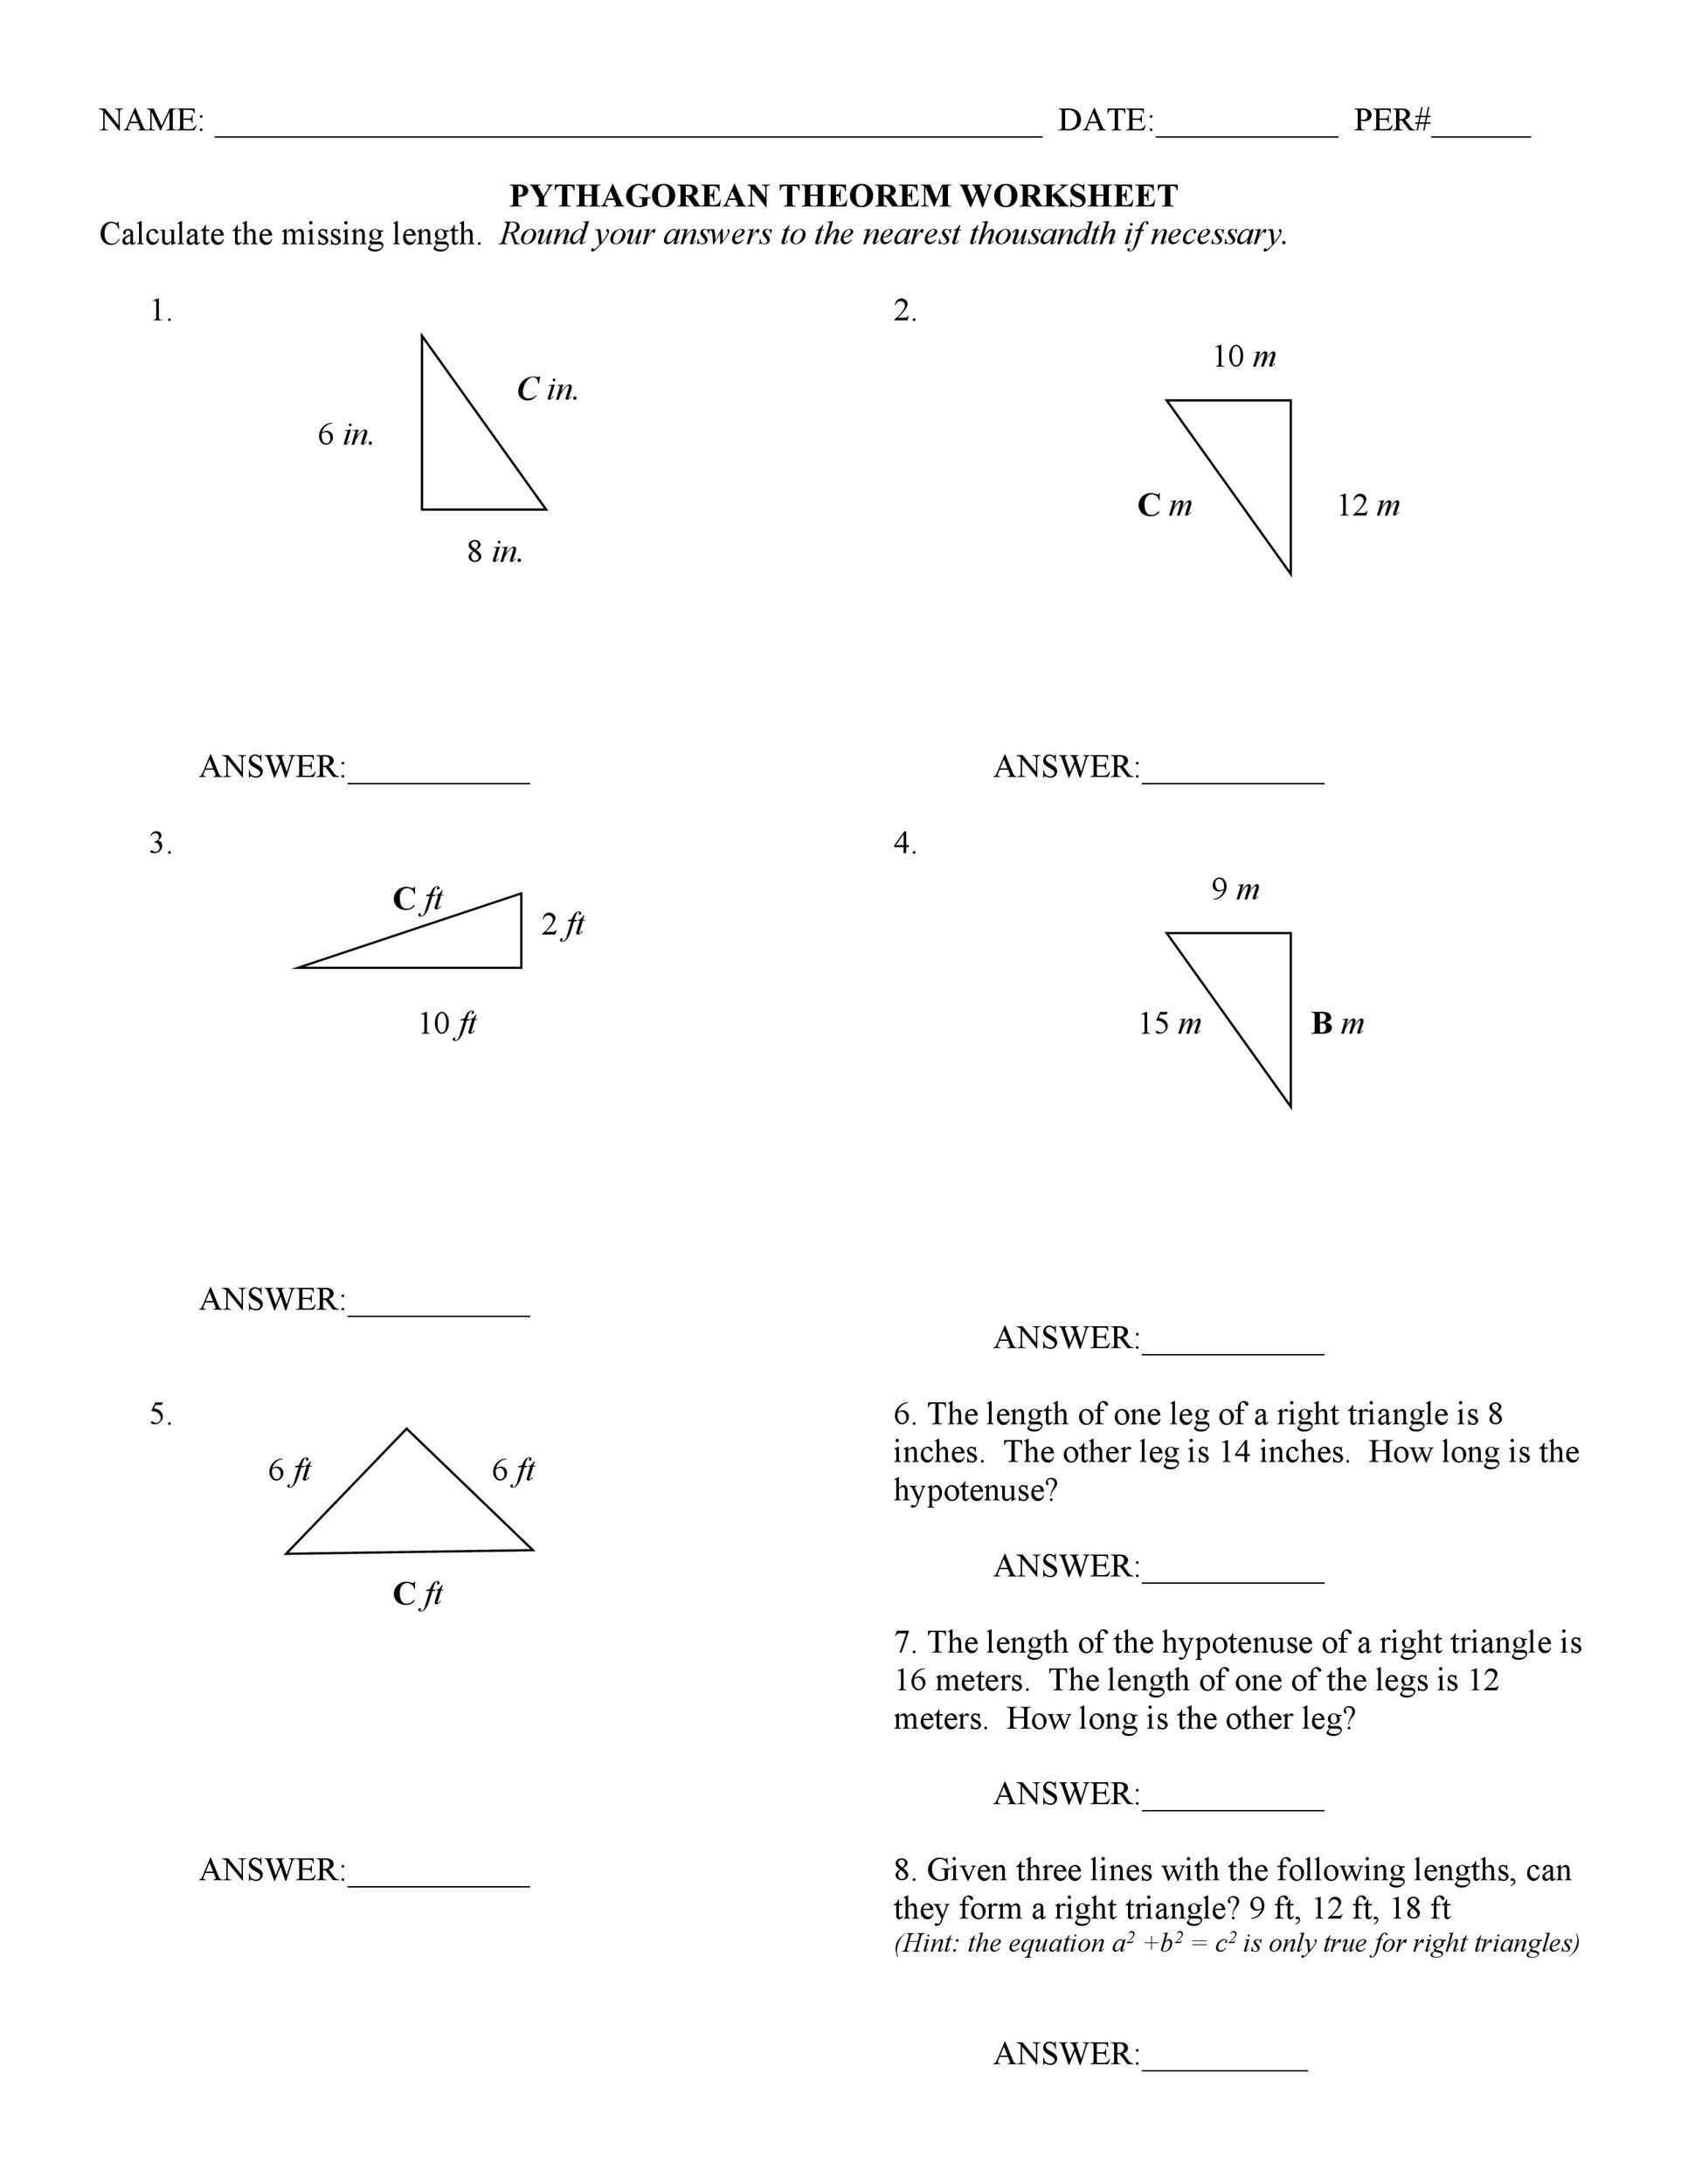 Free pythagorean theorem 23